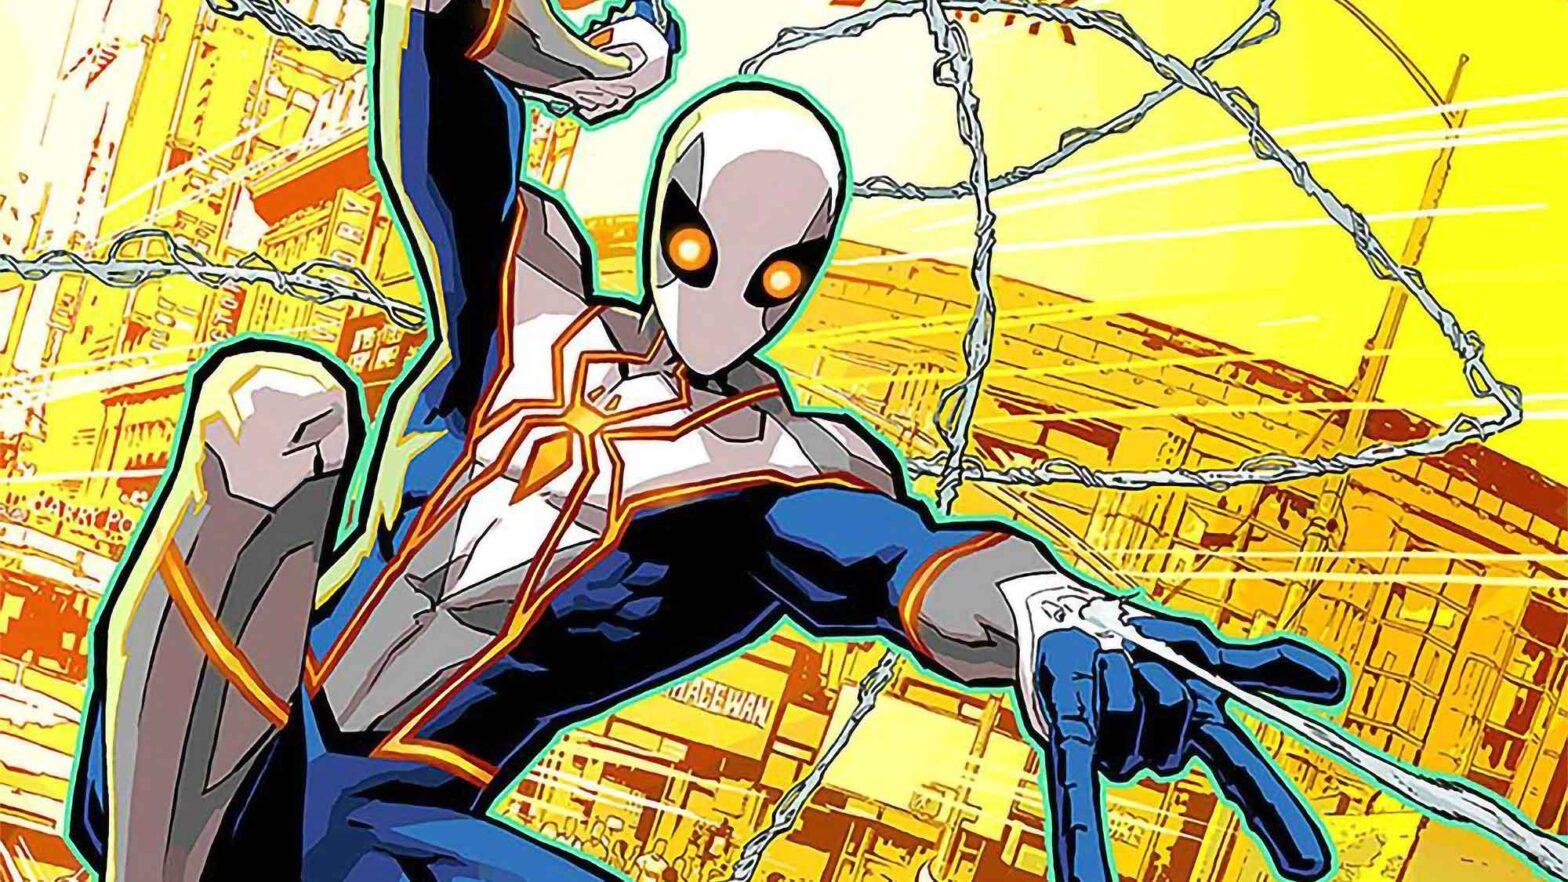 Marvel Spider-Man Gets New Costume